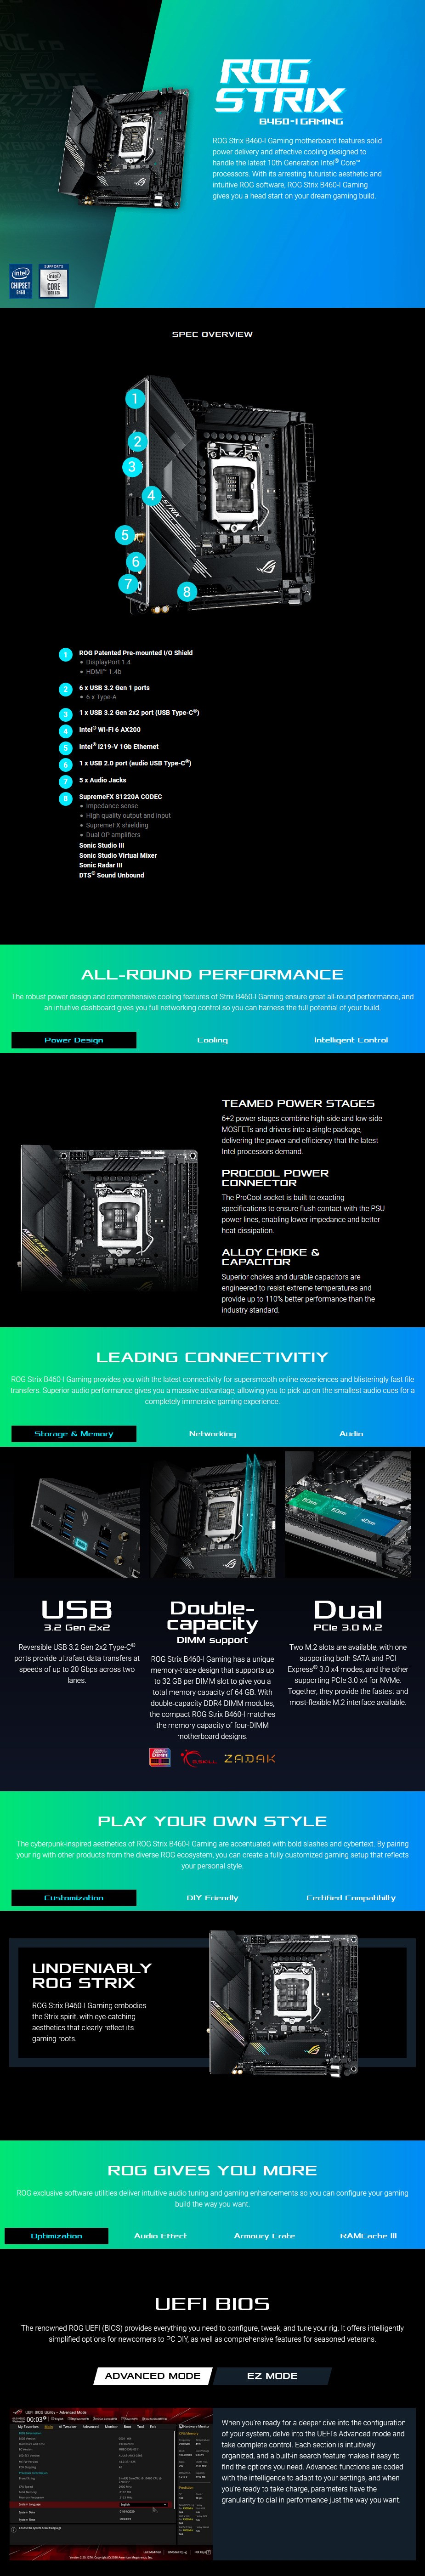 ASUS ROG STRIX B460-I GAMING LGA 1200 Mini-ITX Motherboard - Overview 1